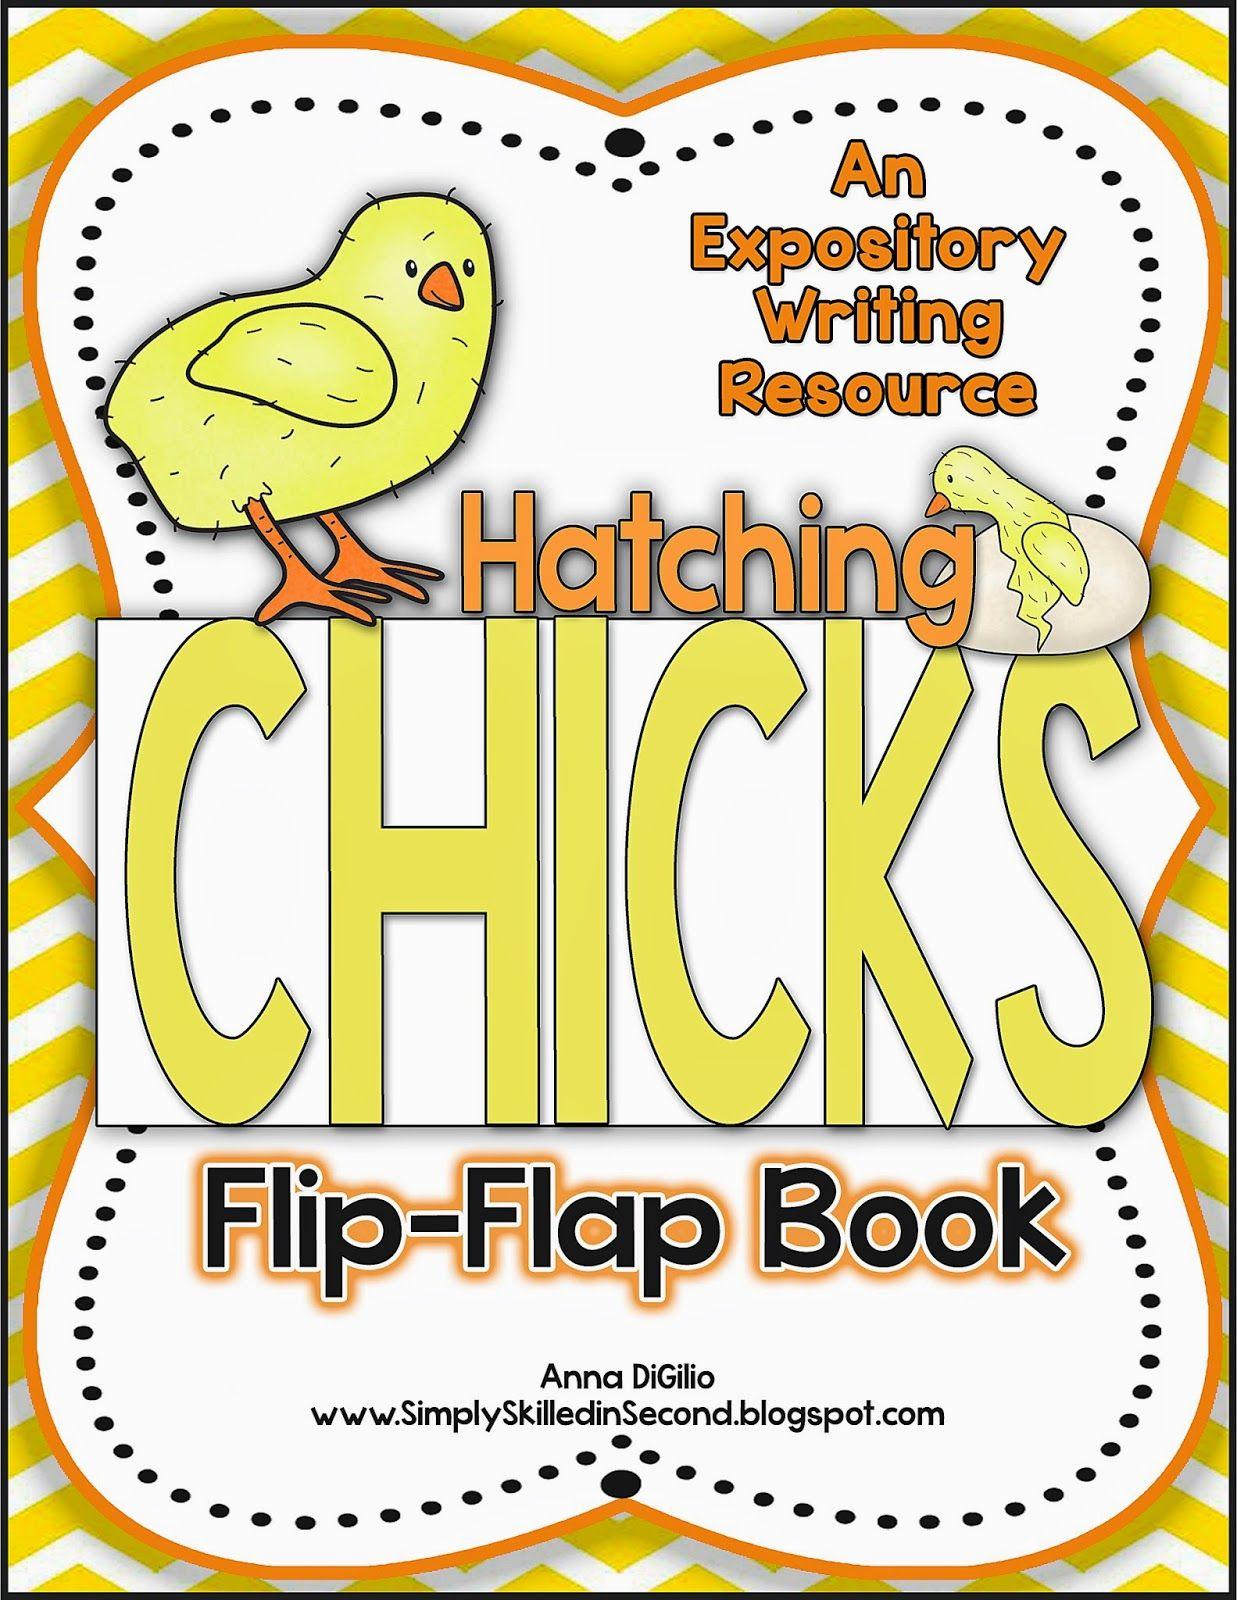 Peep Ep Hatching Chicks